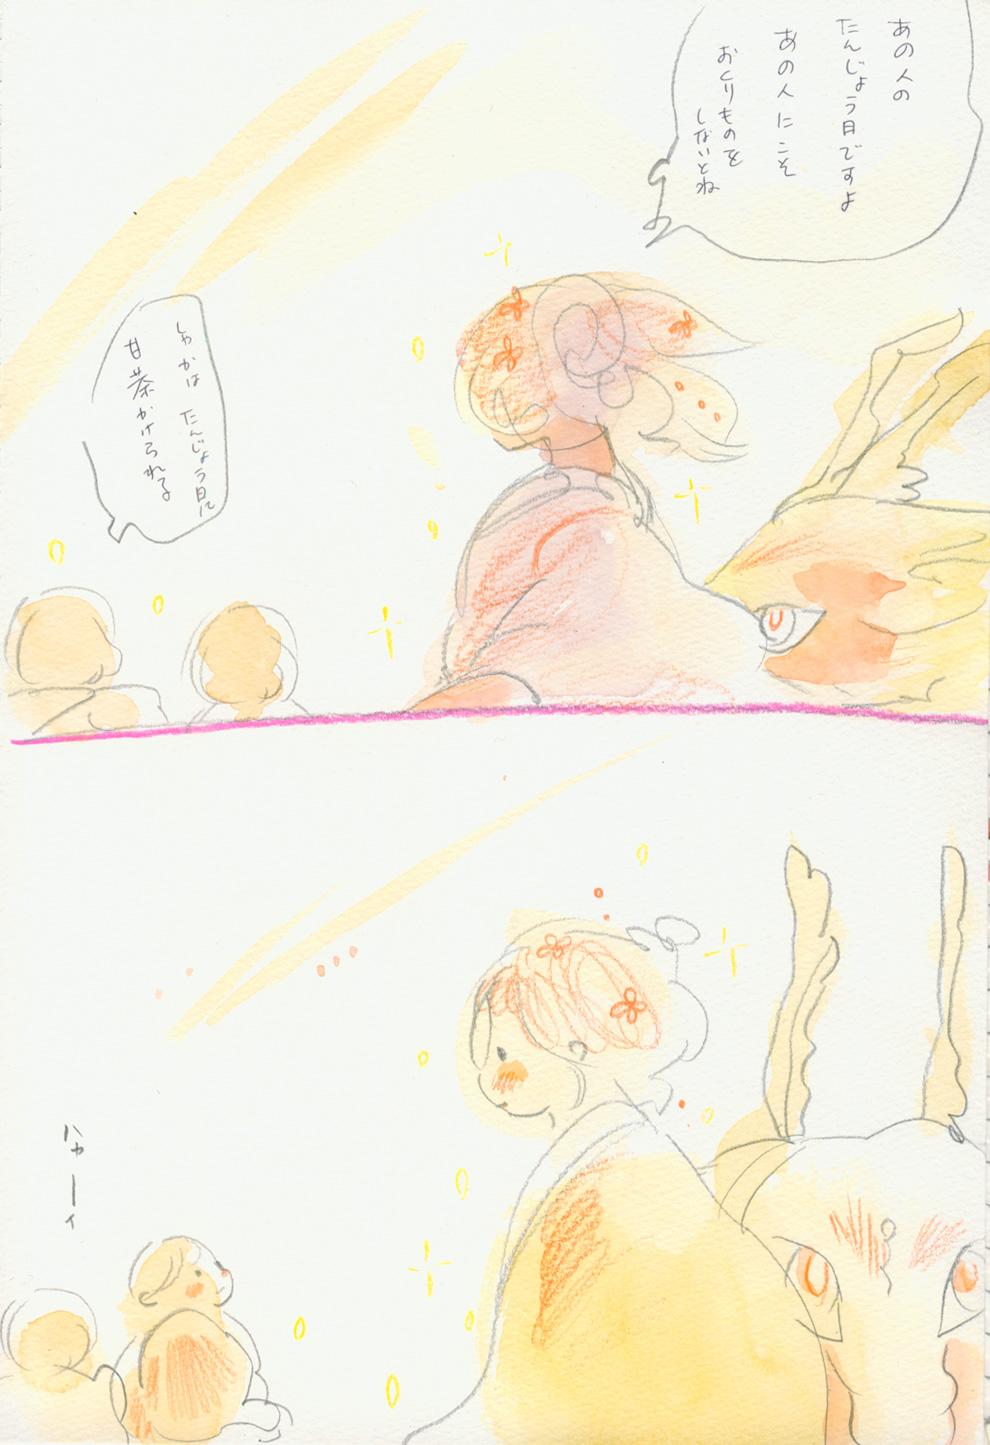 http://ahito.com/comic/ehon/kamiuta/img/2017/20171224/03.jpg